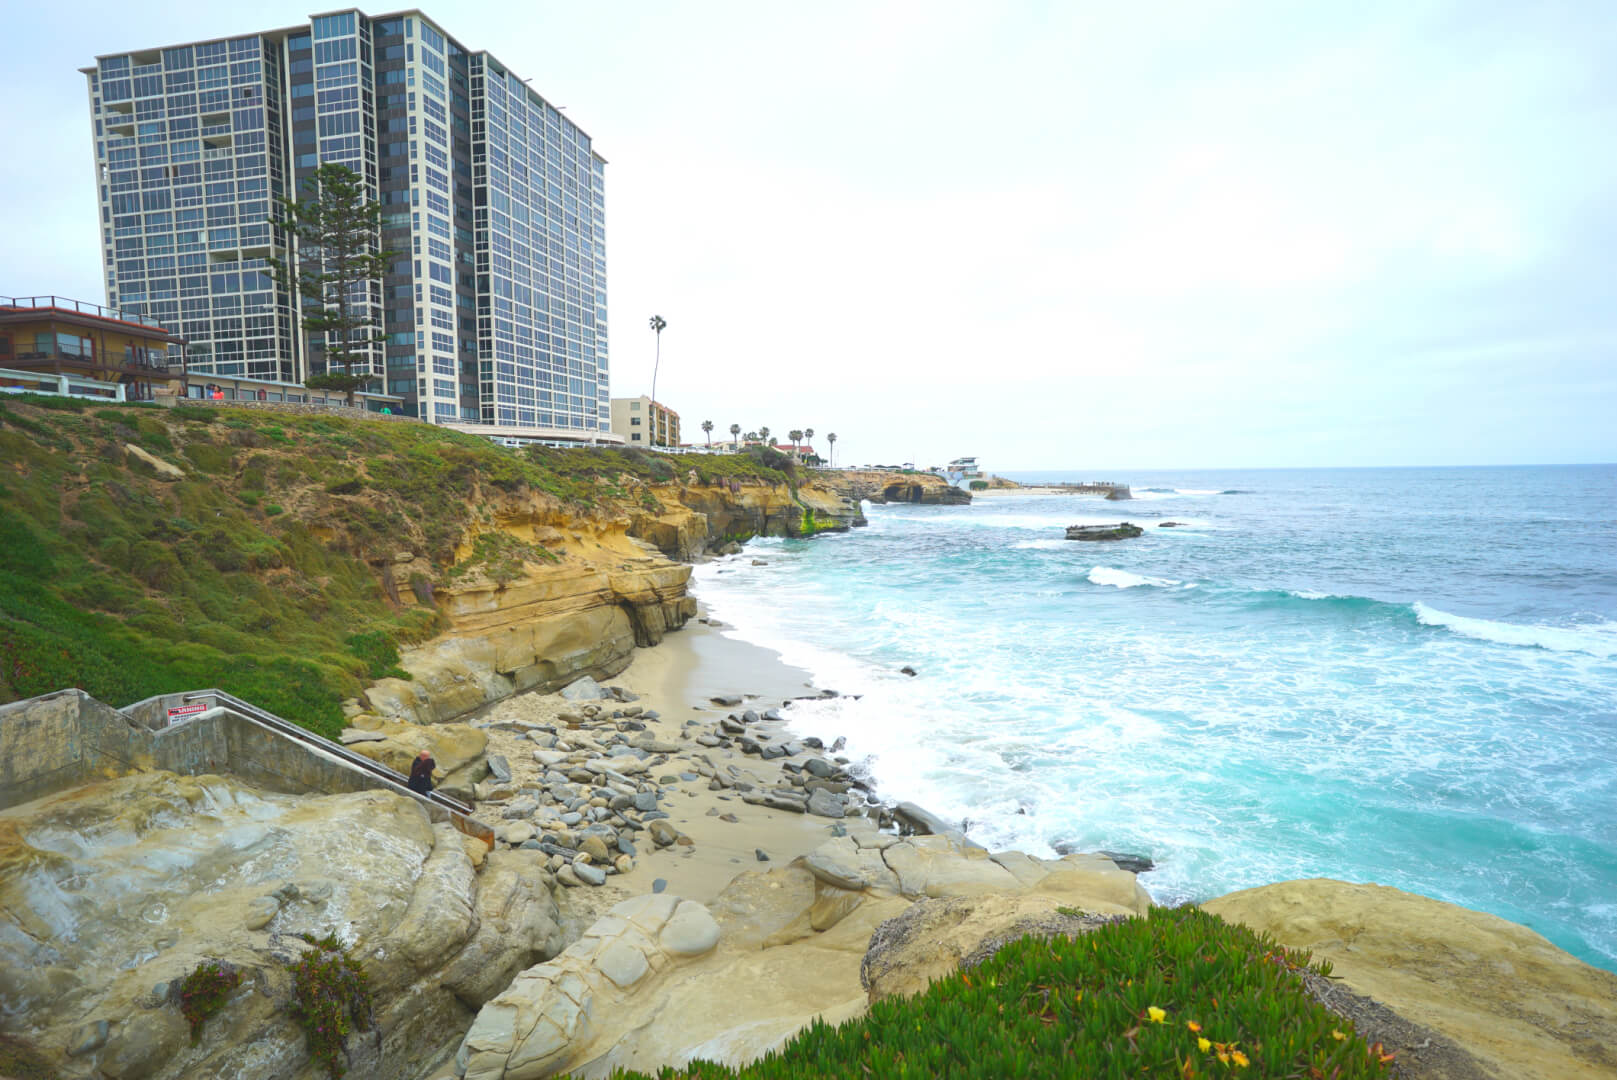 la jolla recovery drug rehab san diego ocean rocks apartments